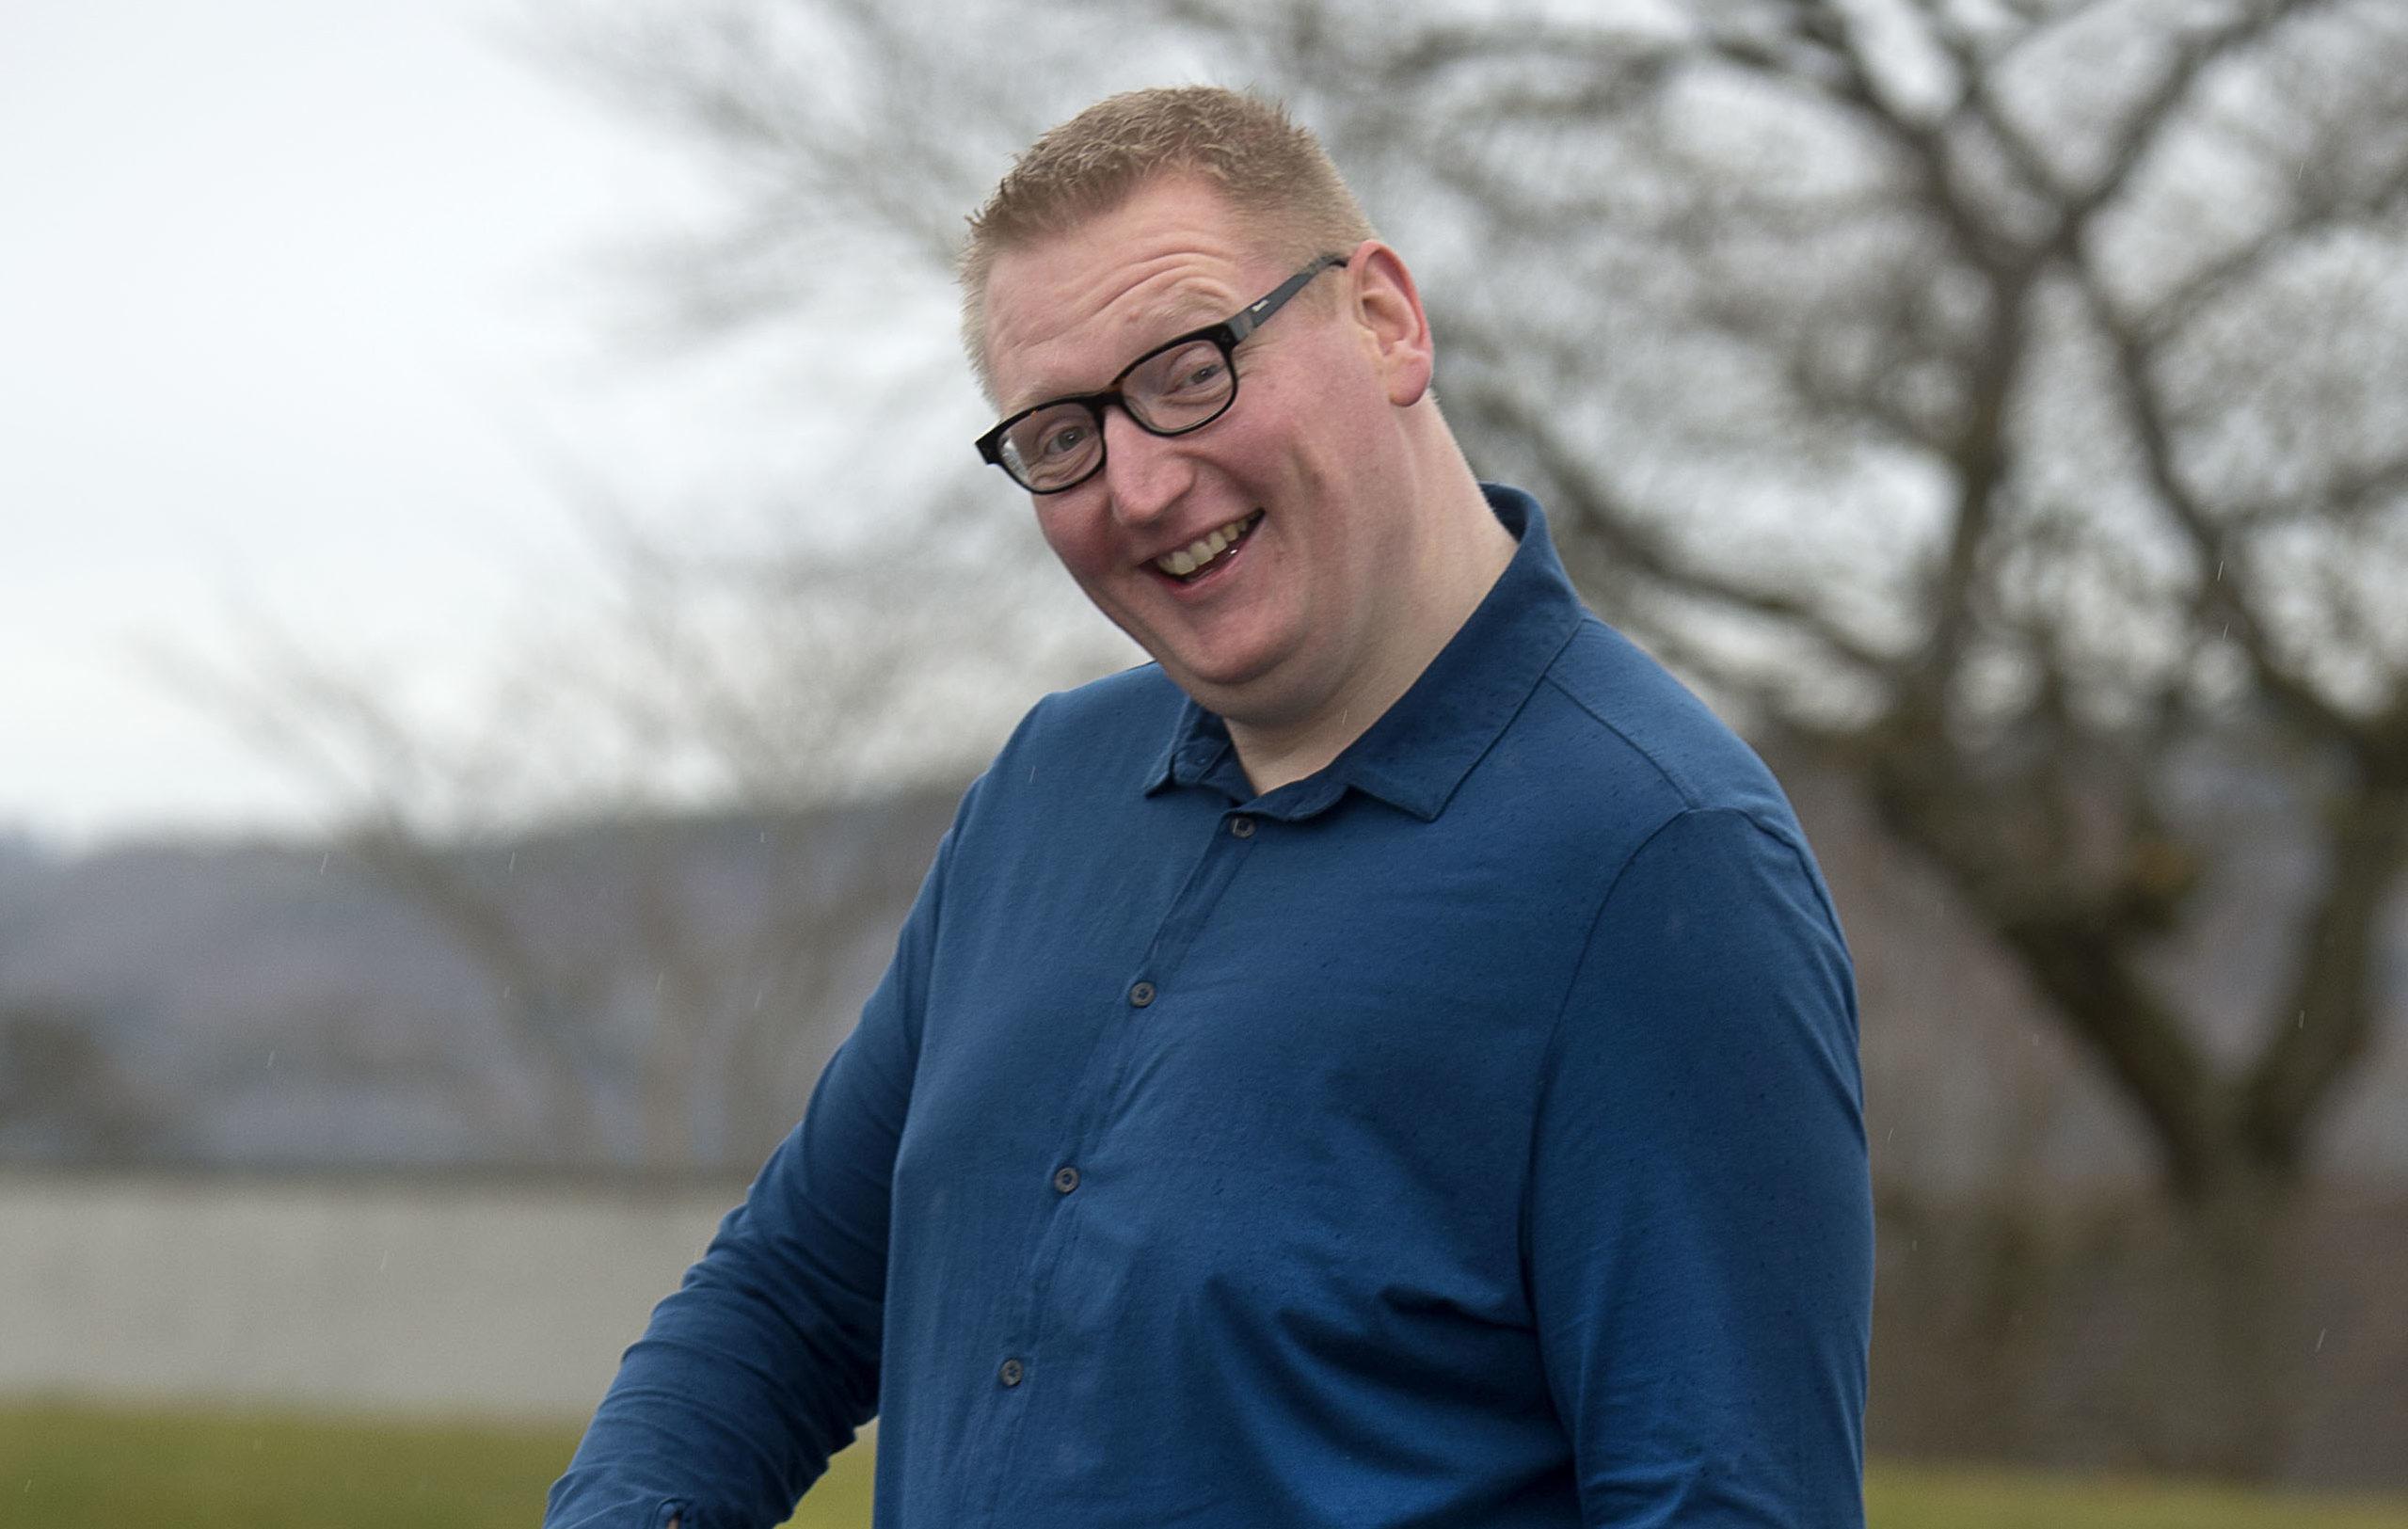 David Walker, Inverness (Trevor Martin)